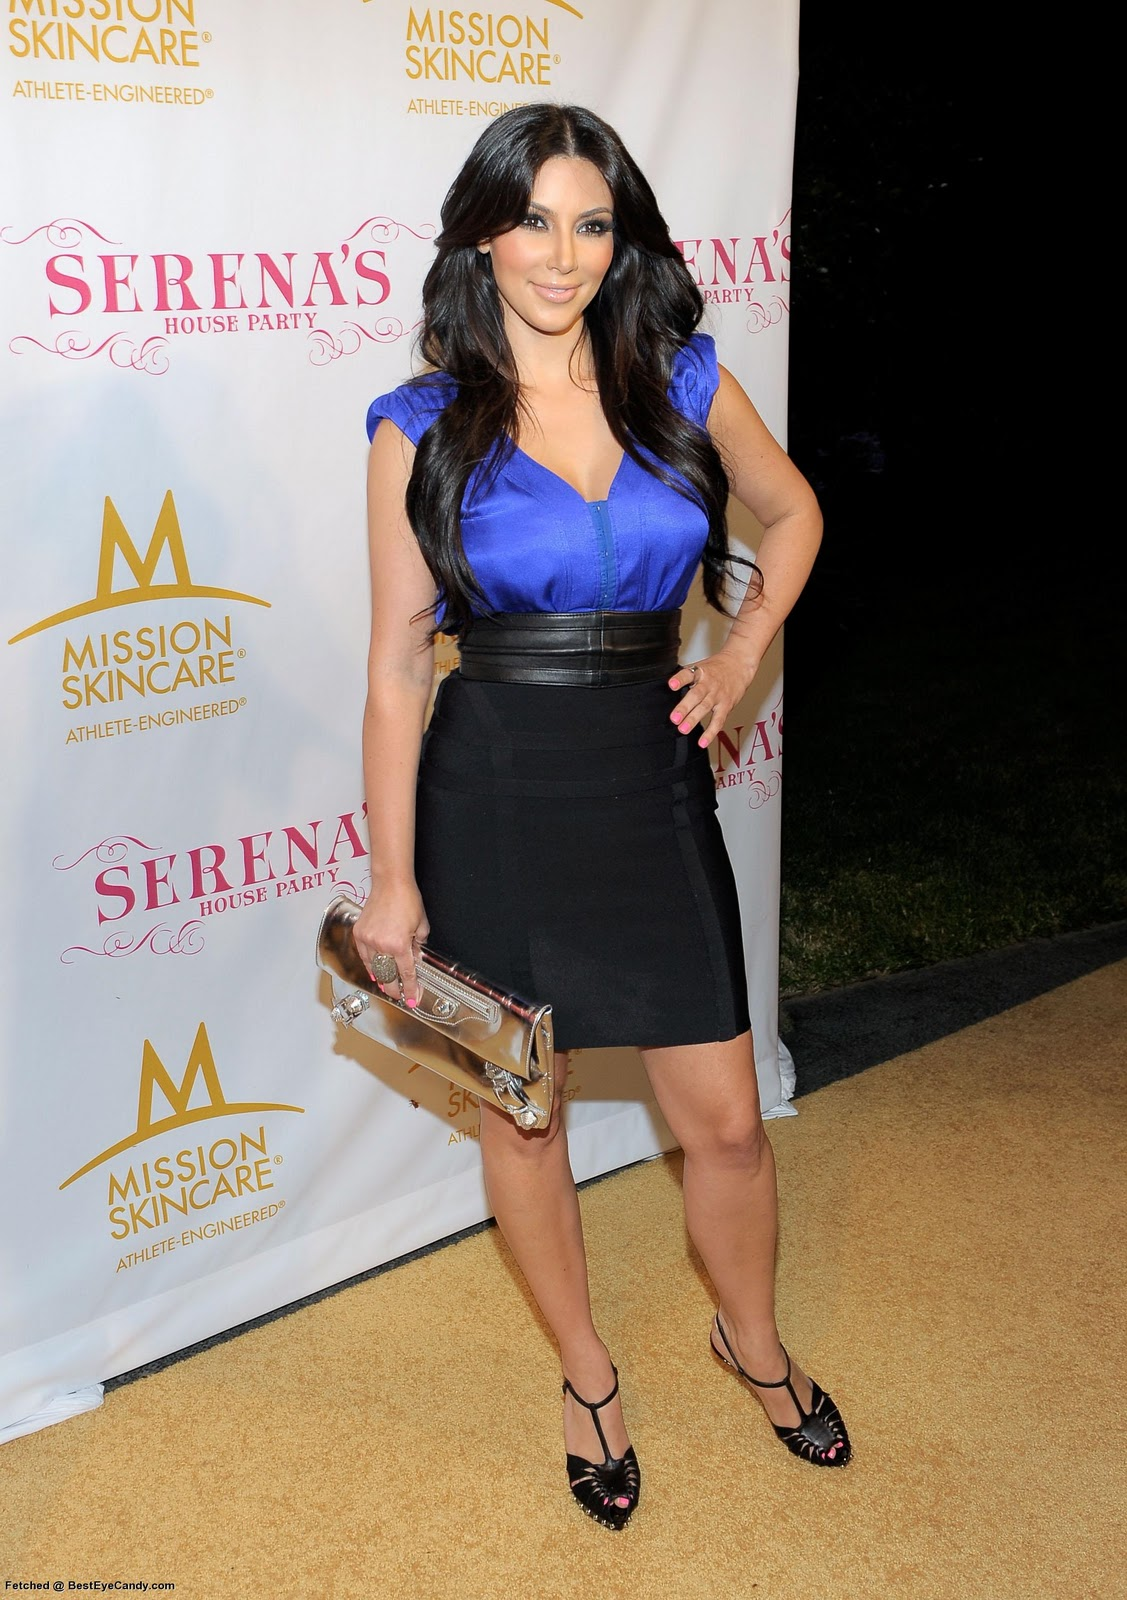 http://4.bp.blogspot.com/_3ogepUVaST0/TJ4QZ47-snI/AAAAAAAAHdU/o8oQF5J9urc/s1600/Kimberly_Kardashian_1014698_BestEyeCandyCOM.jpg